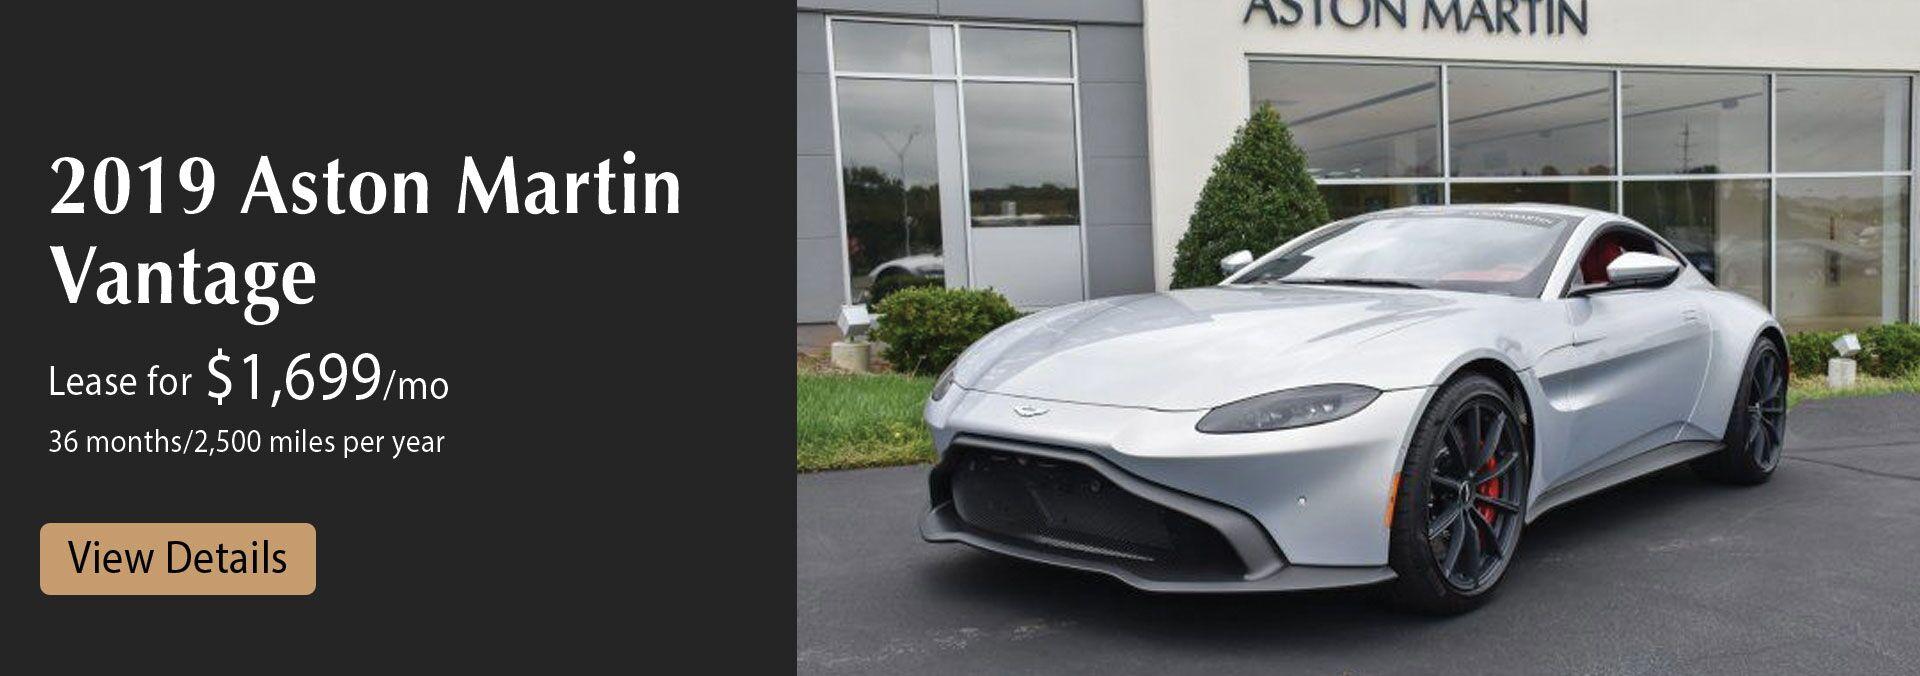 Aston Martin Ferrari Maserati Porsche Dealership Greensboro Nc